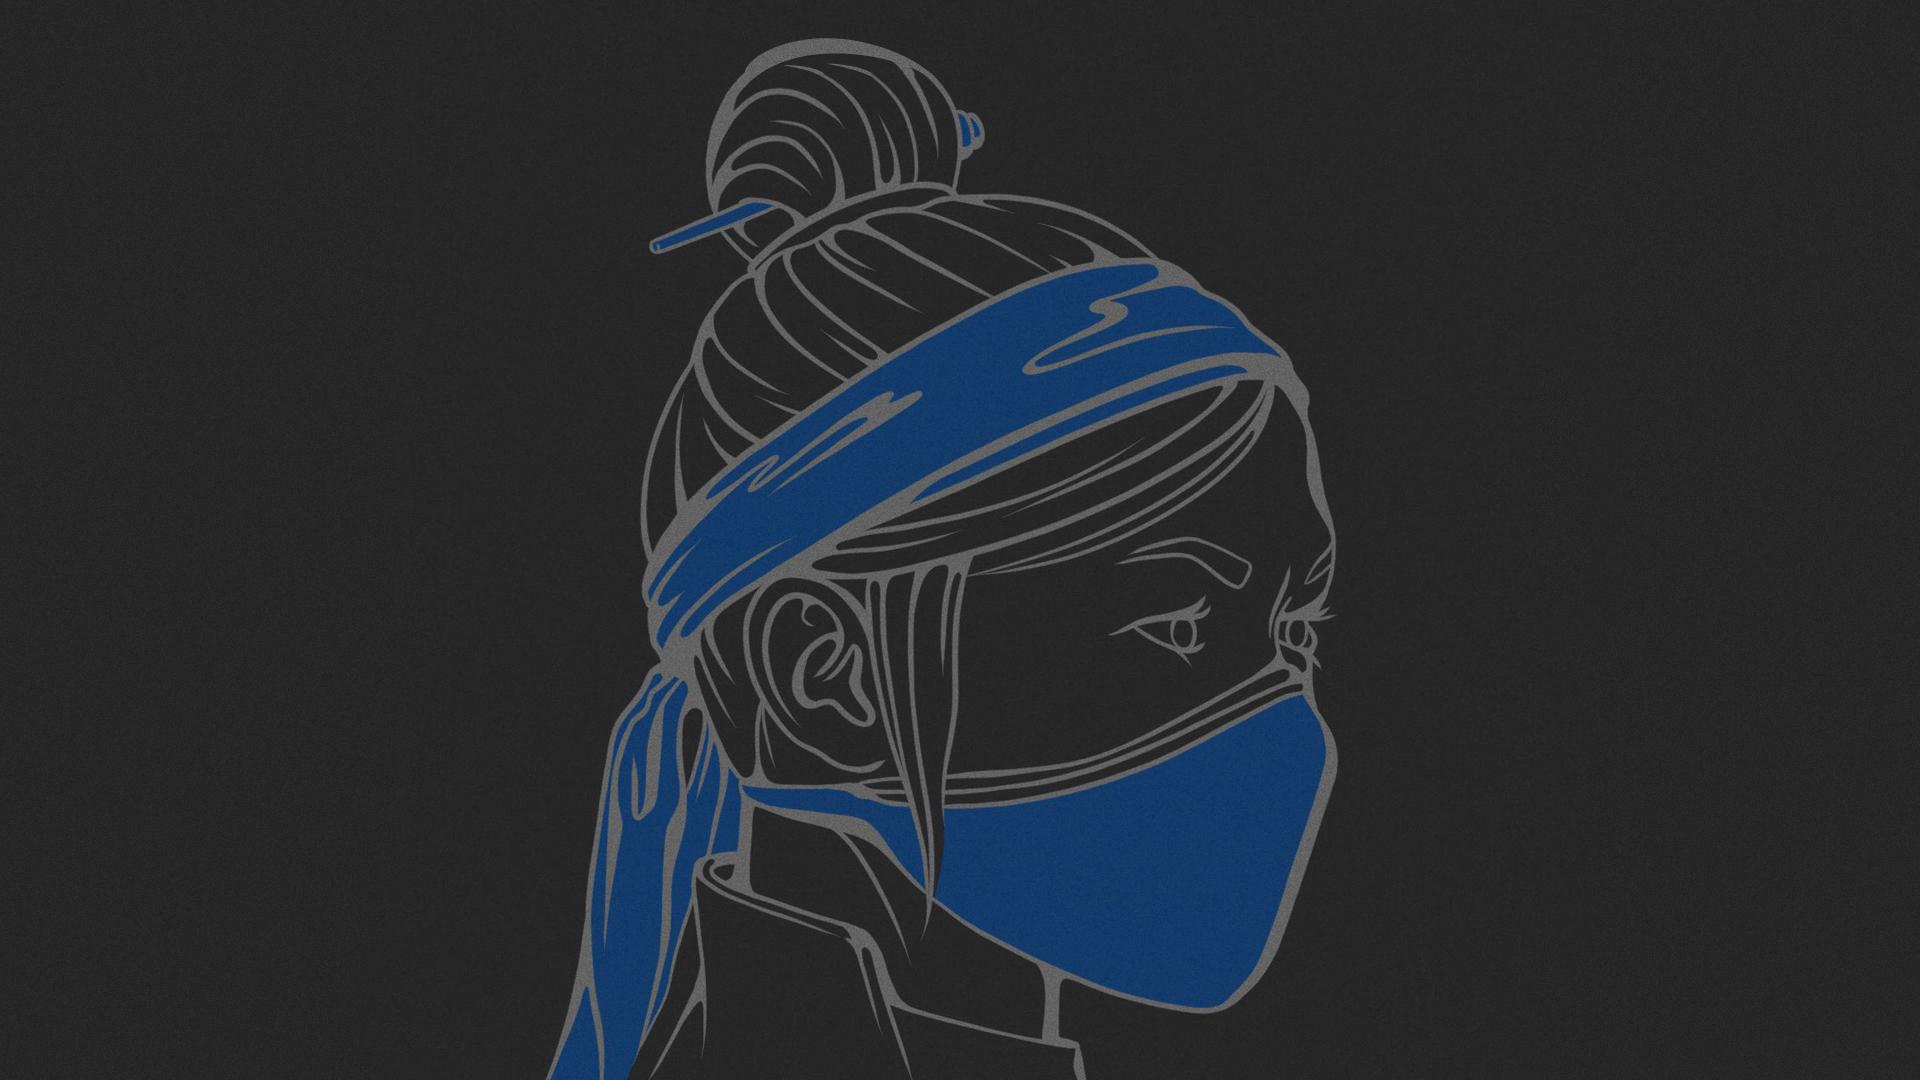 Mortal Kombat background - Kitana